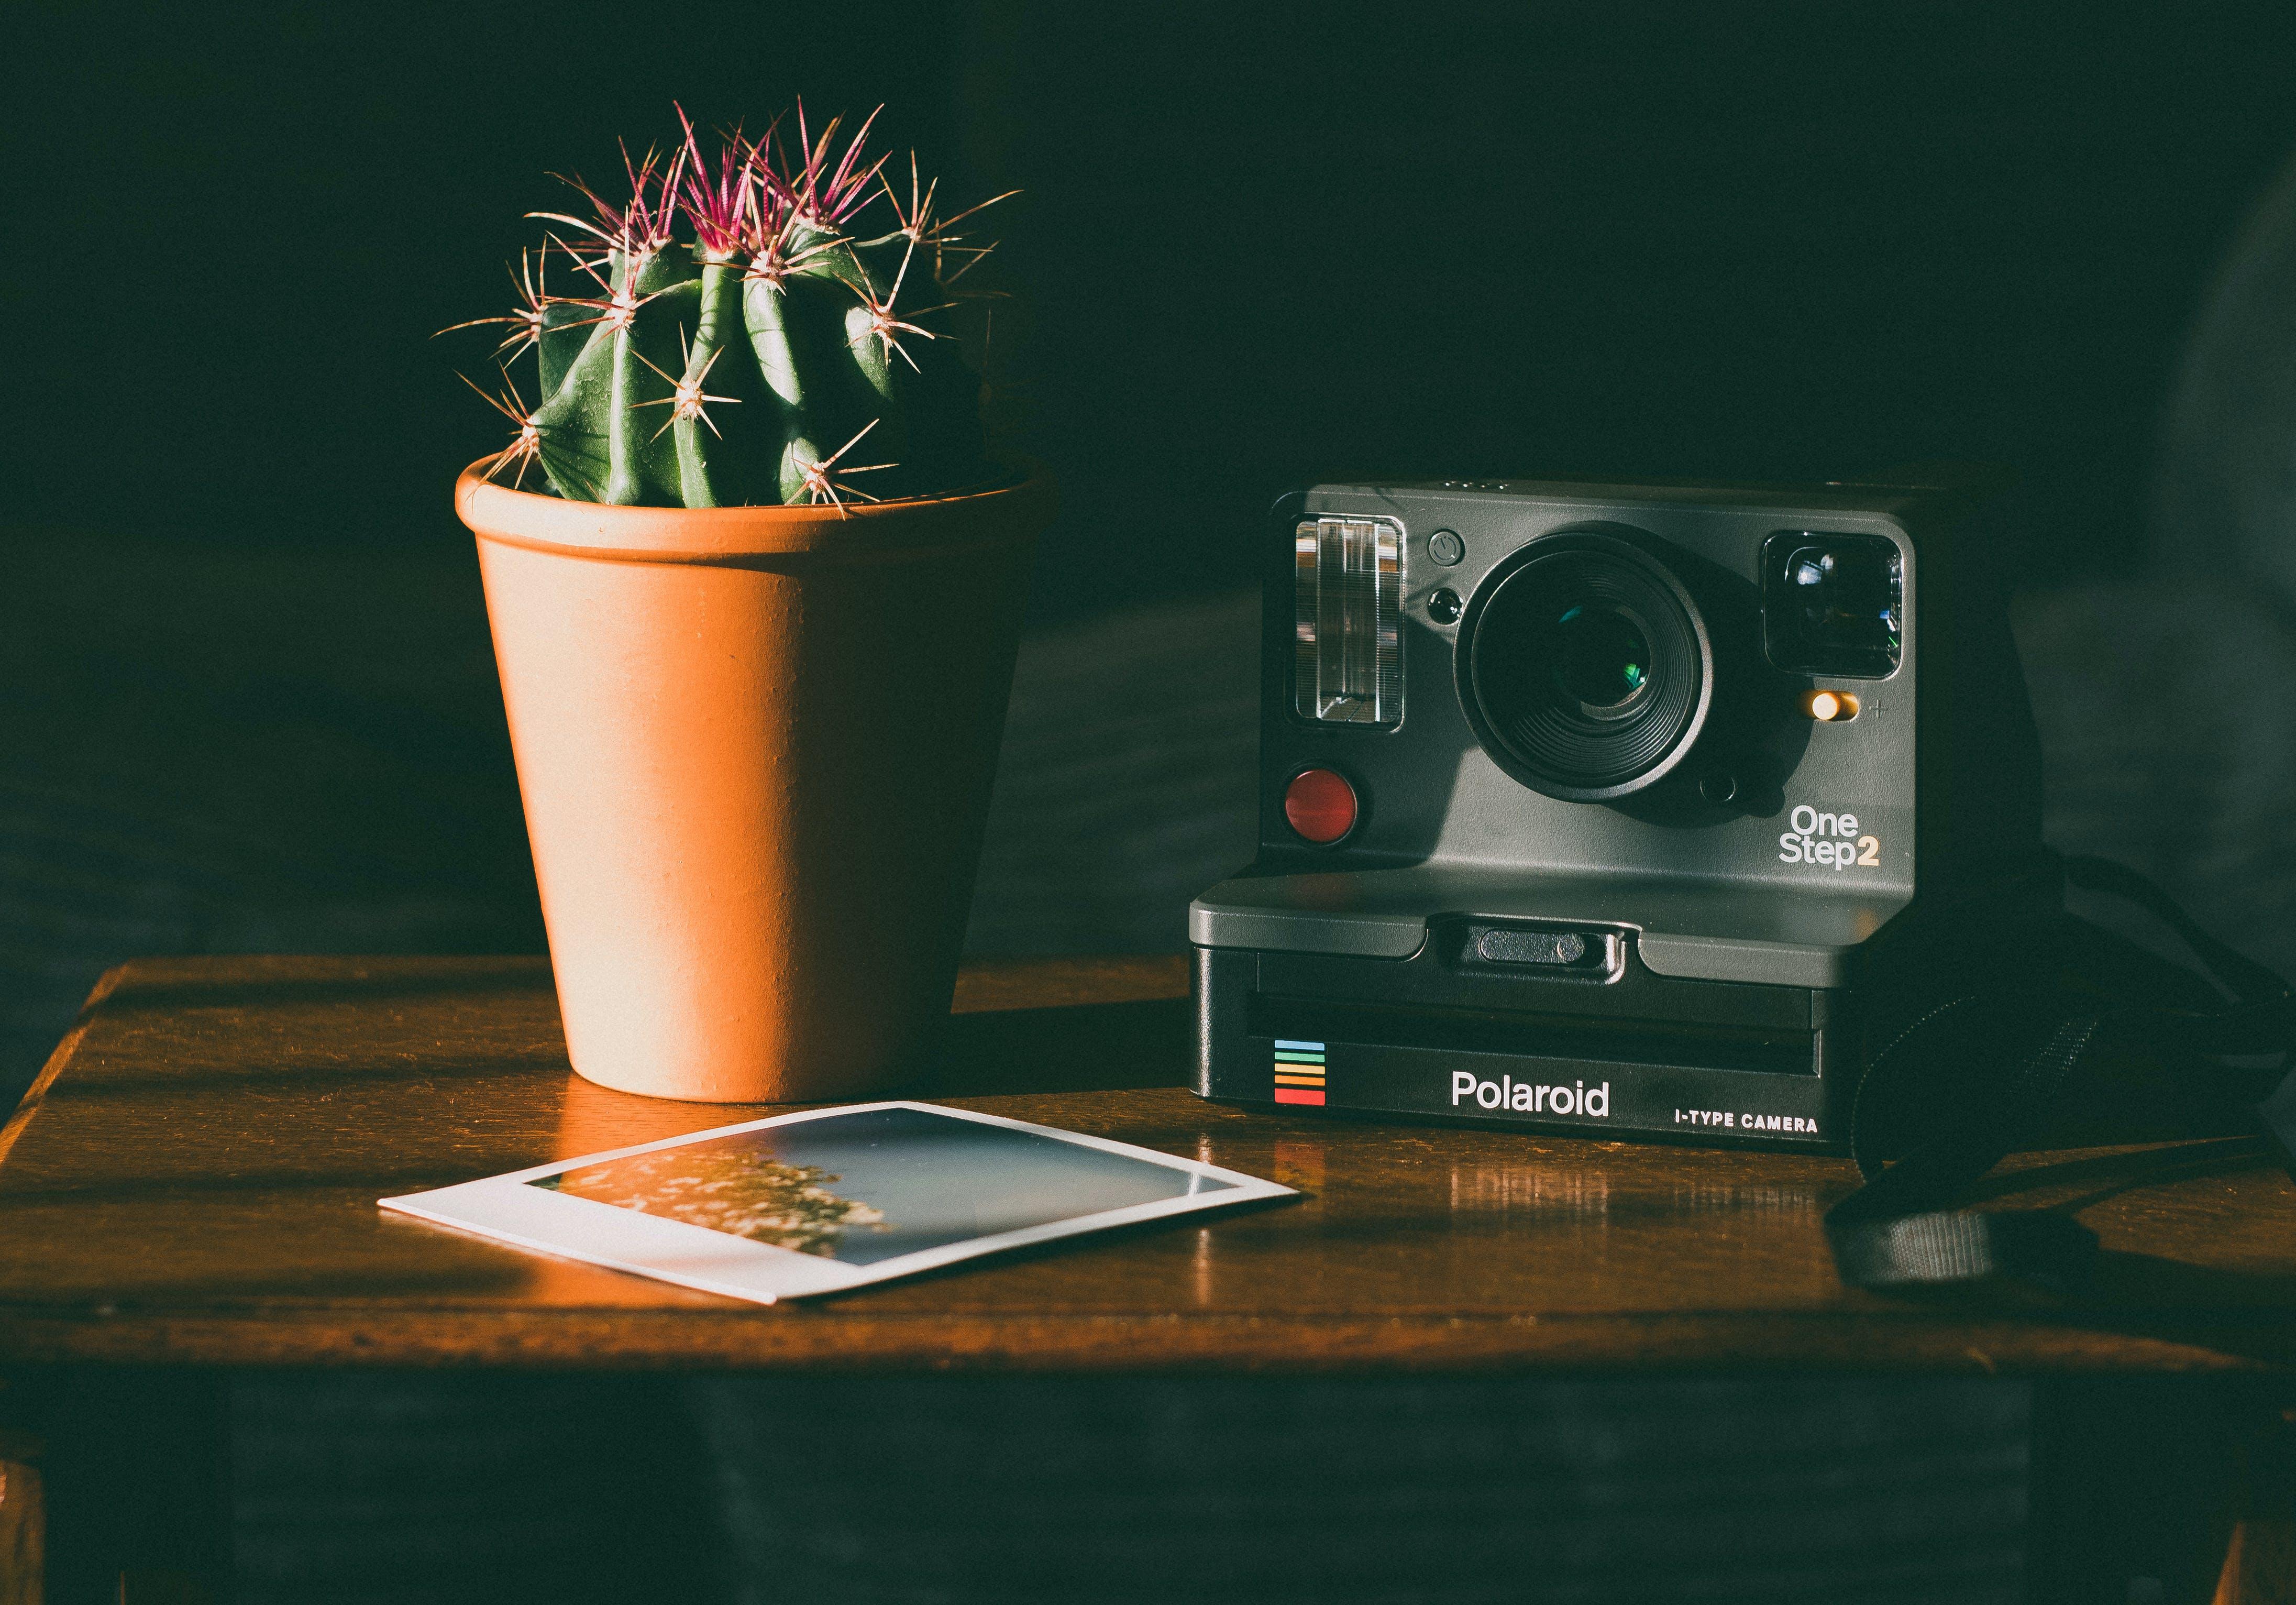 analogkamera, bild, elektrik